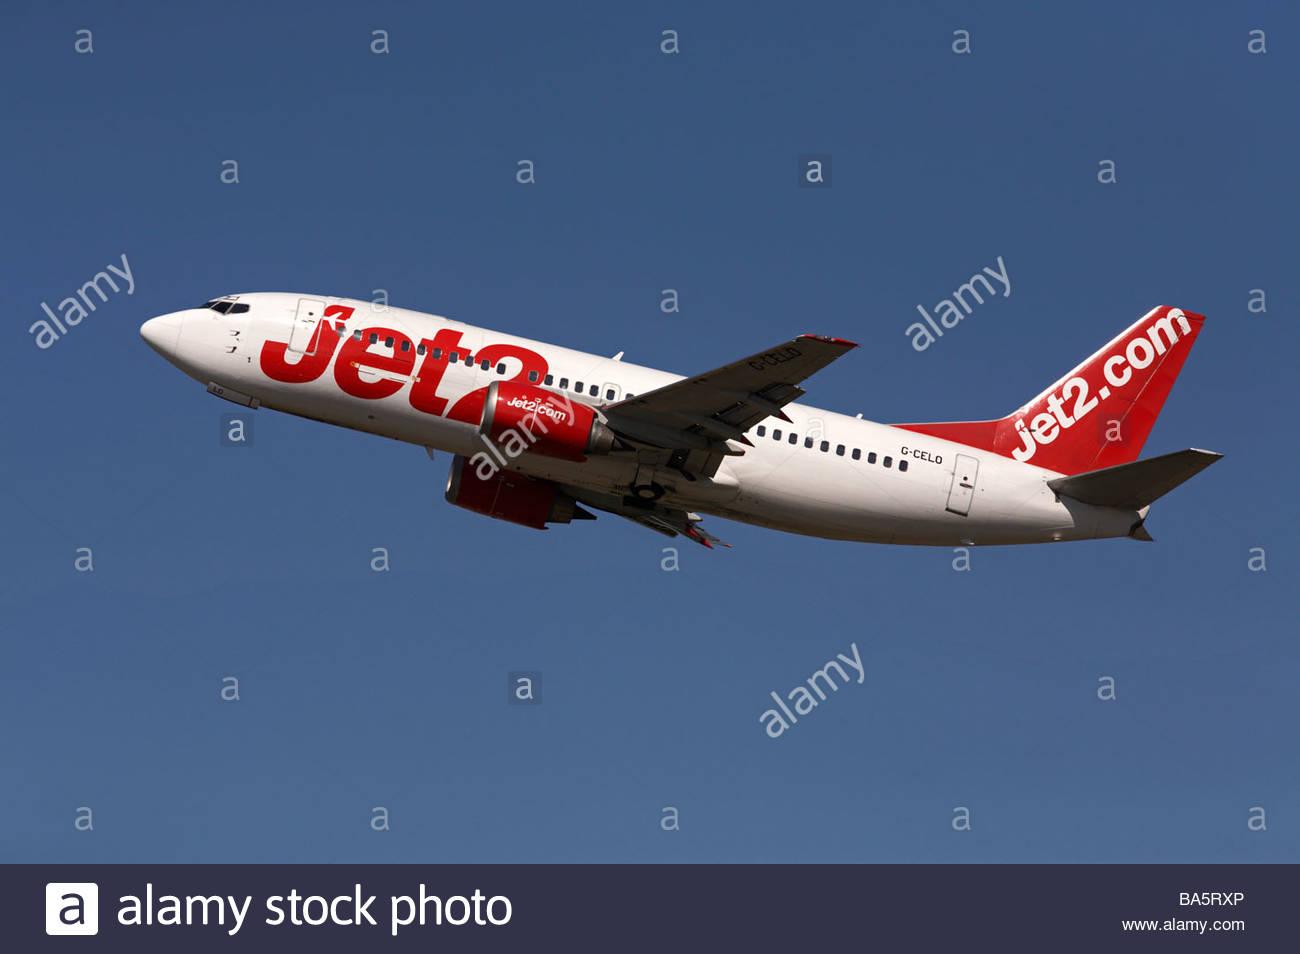 Jet2.com flight shortly after takeoff - Stock Image